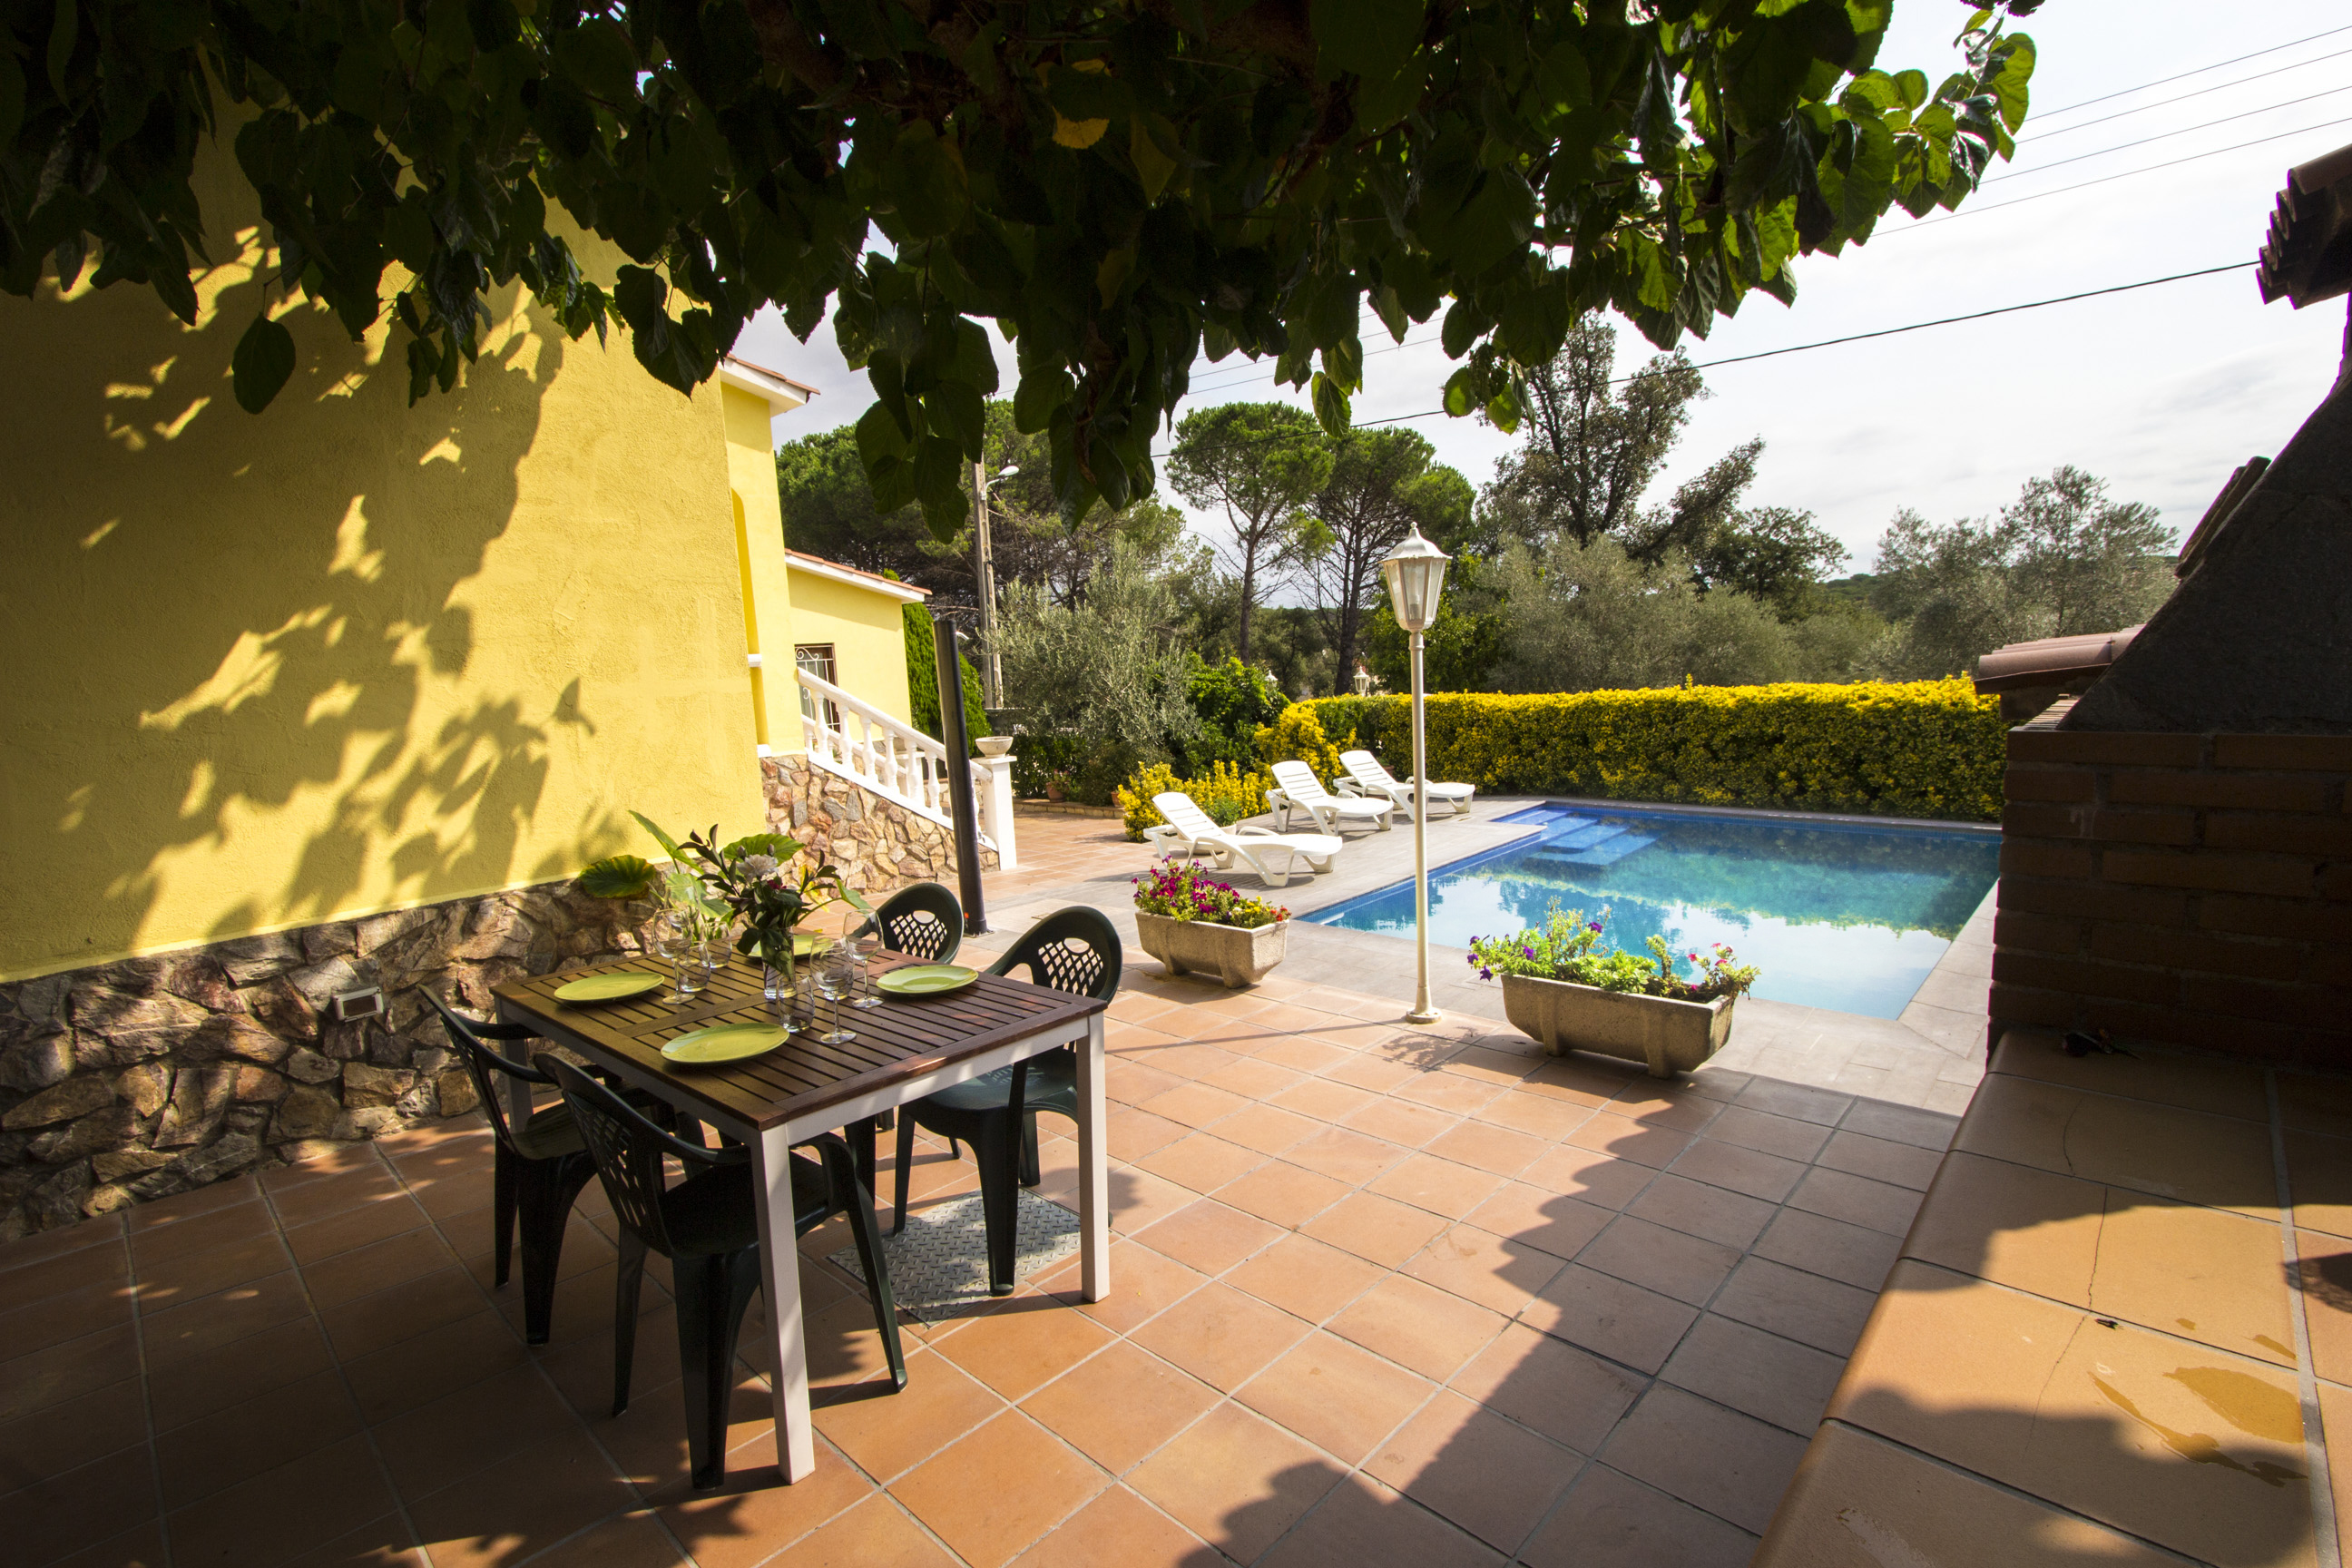 Ferienhaus Catalunya Casas: Peaceful Villa Sils, just 20 km from Costa Brava beaches! (2302155), Les Mallorquines, Girona, Katalonien, Spanien, Bild 5